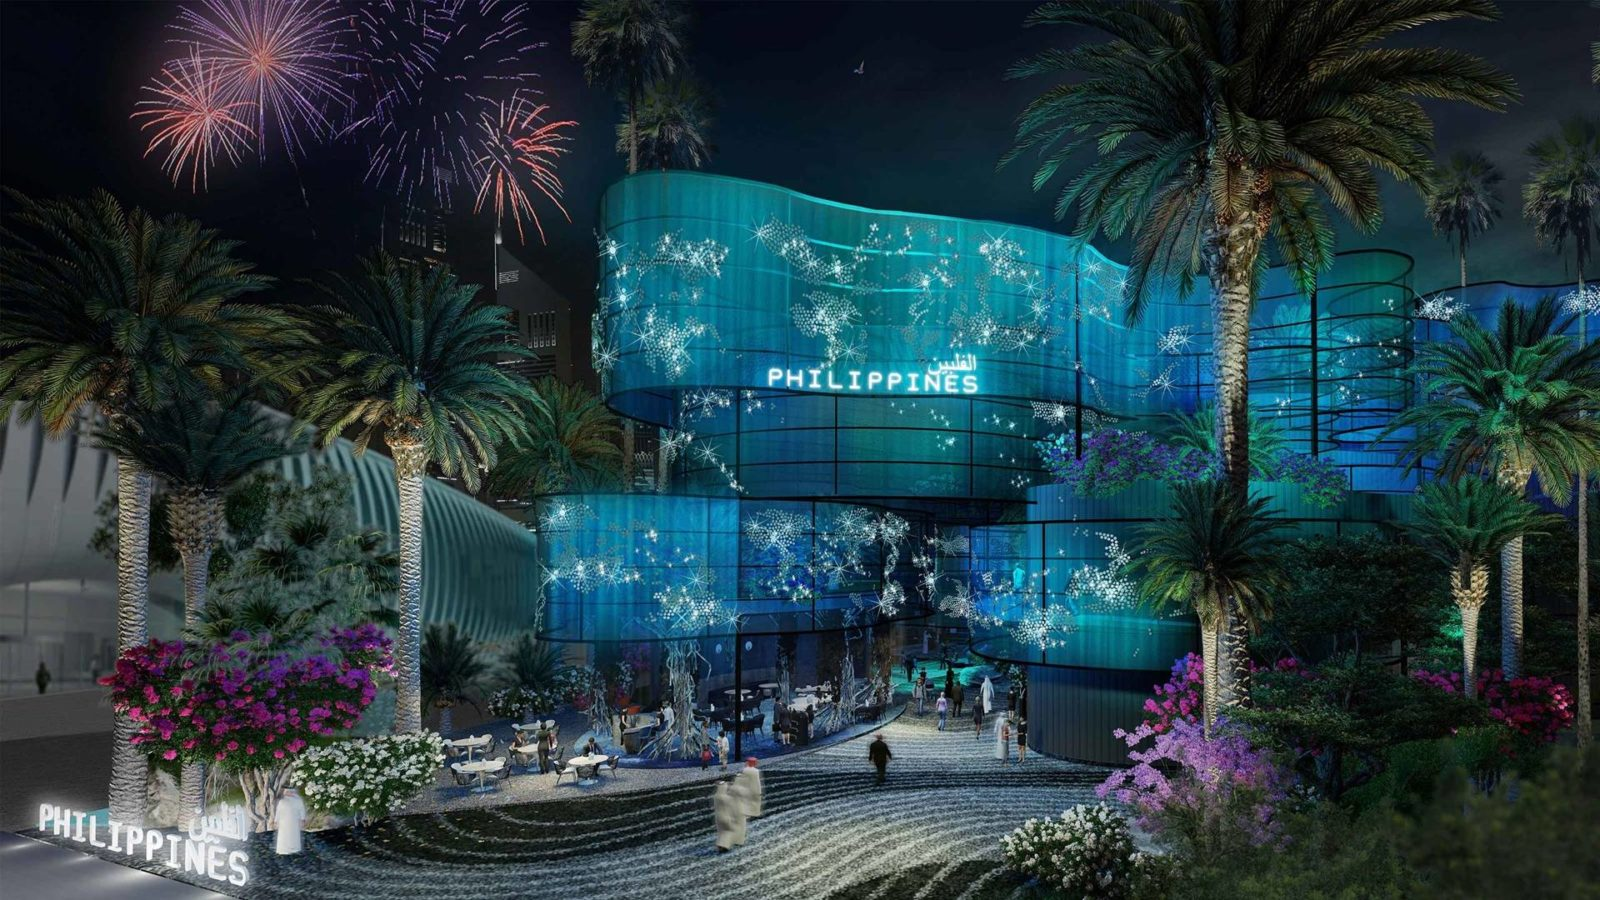 EXPO 2020 – Philippines Pavilion